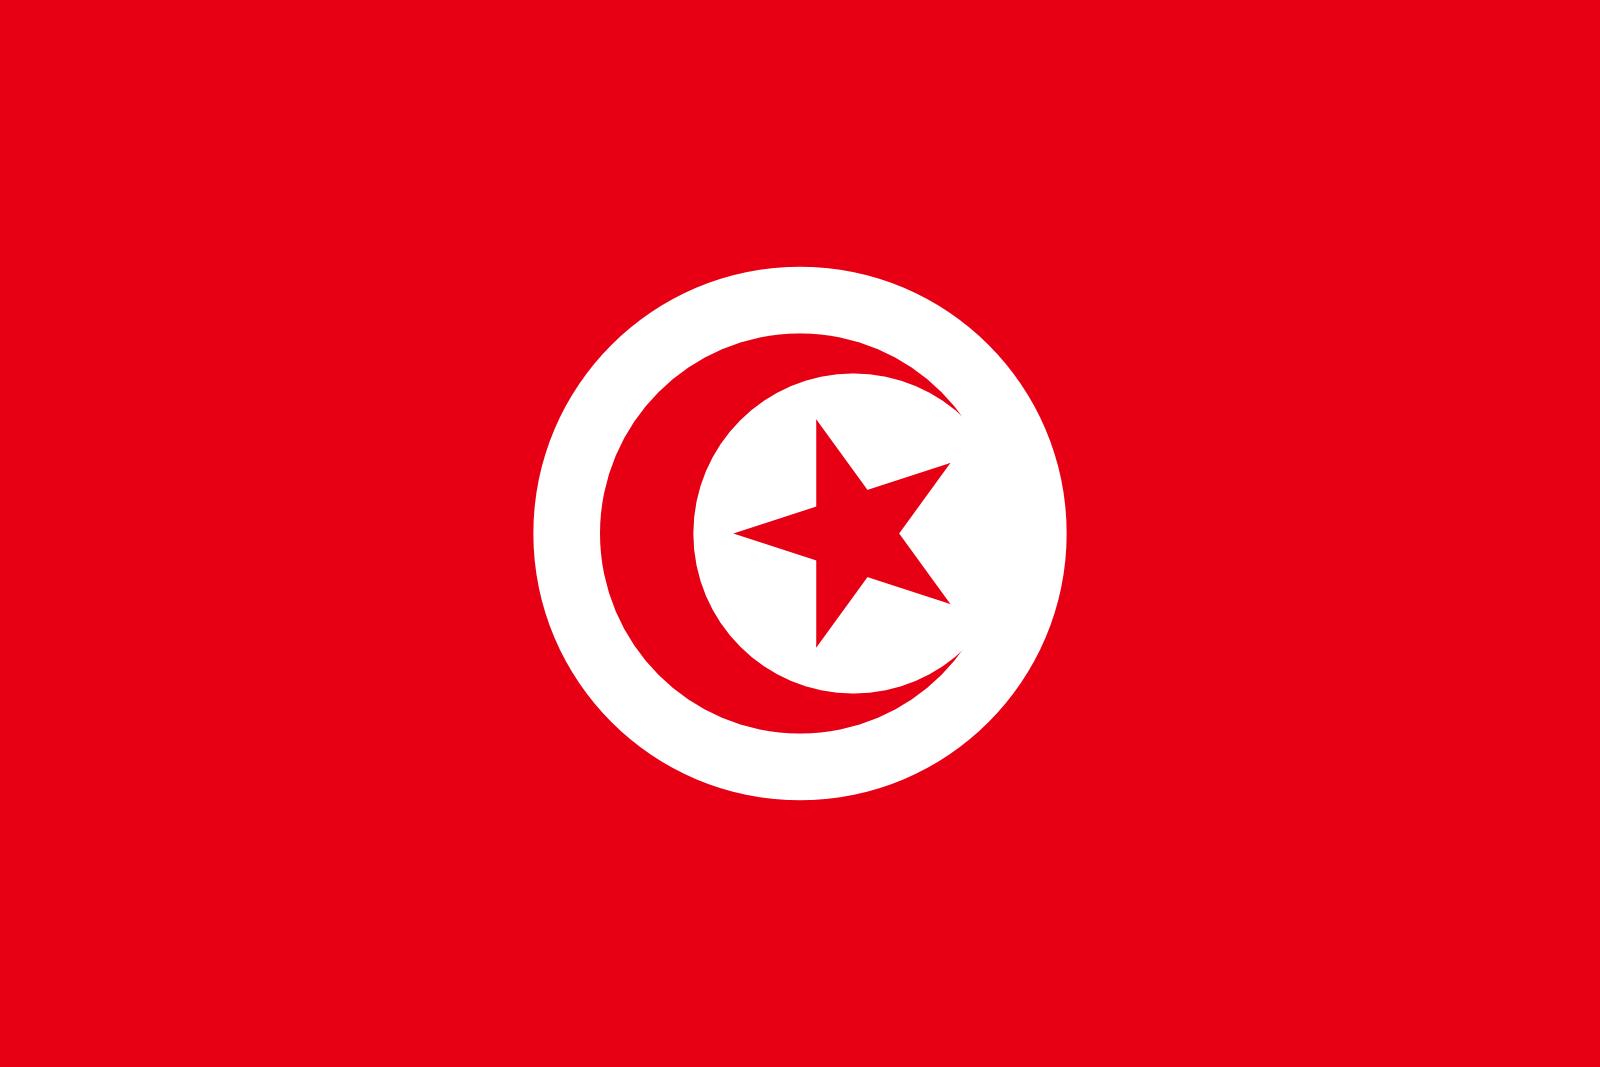 tunisiaflag.png